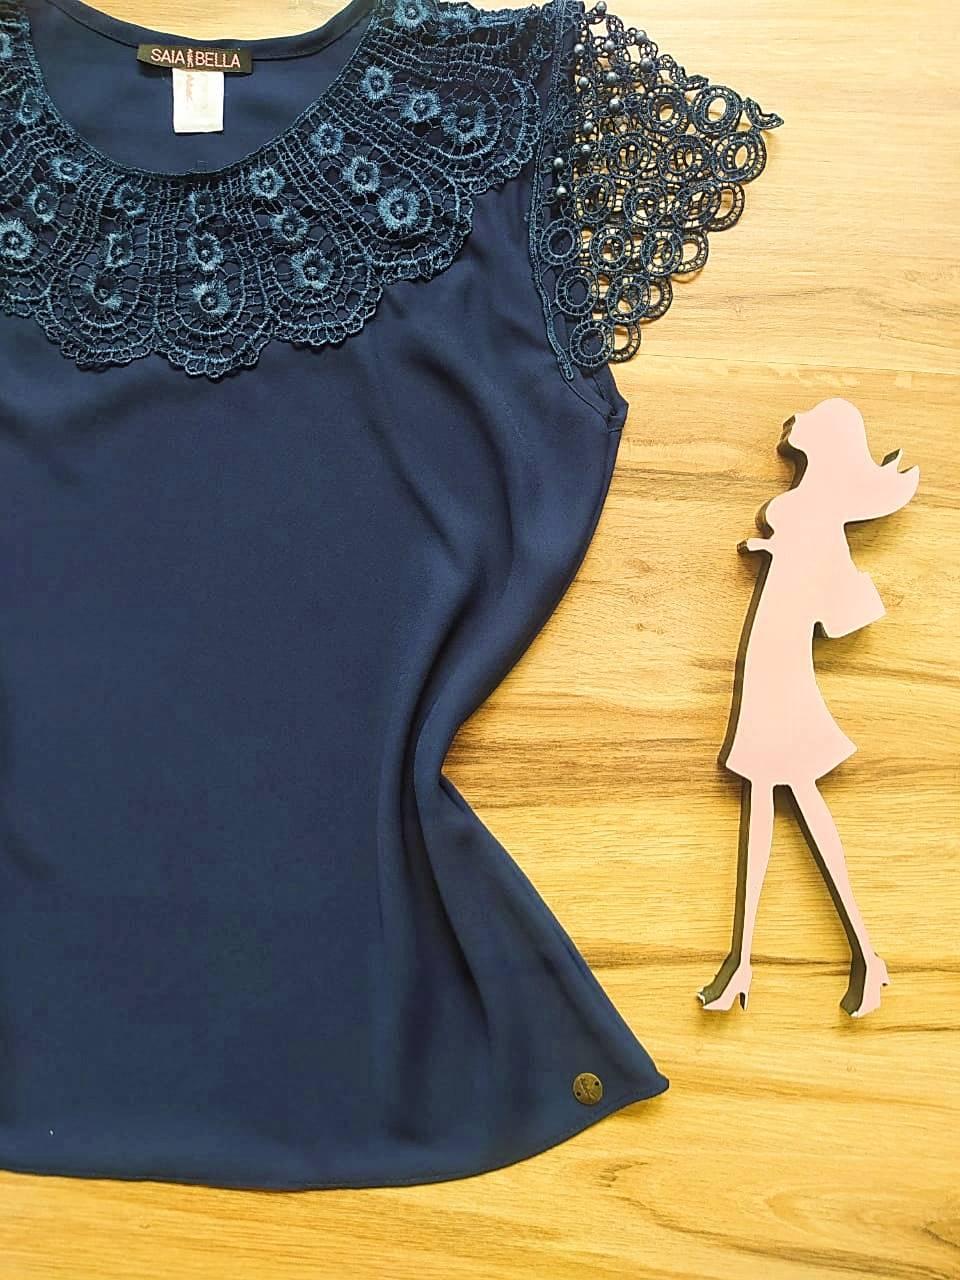 Blusa Fiorella de Renda Saia Bella - SB79902 azul Marinho